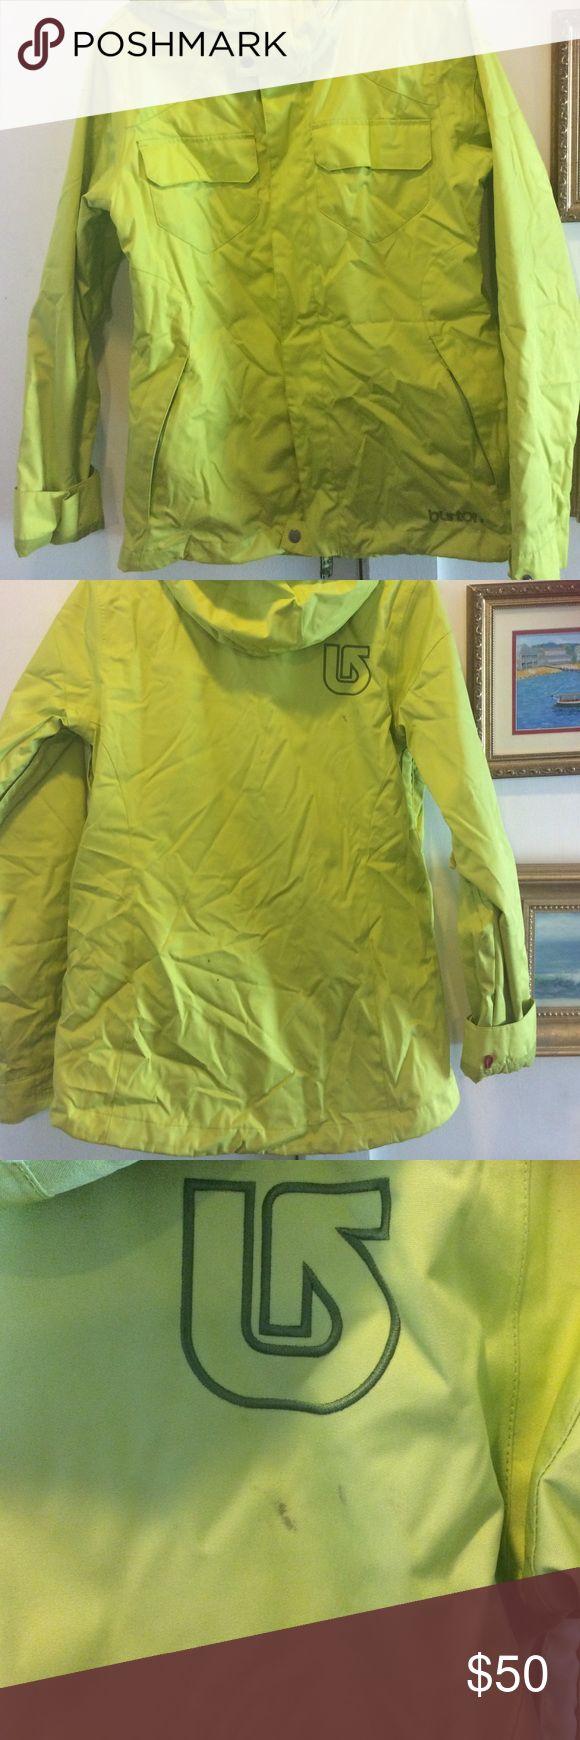 Burton ski jacket Size large fleece lined kids Burton ski jacket Burton Jackets & Coats